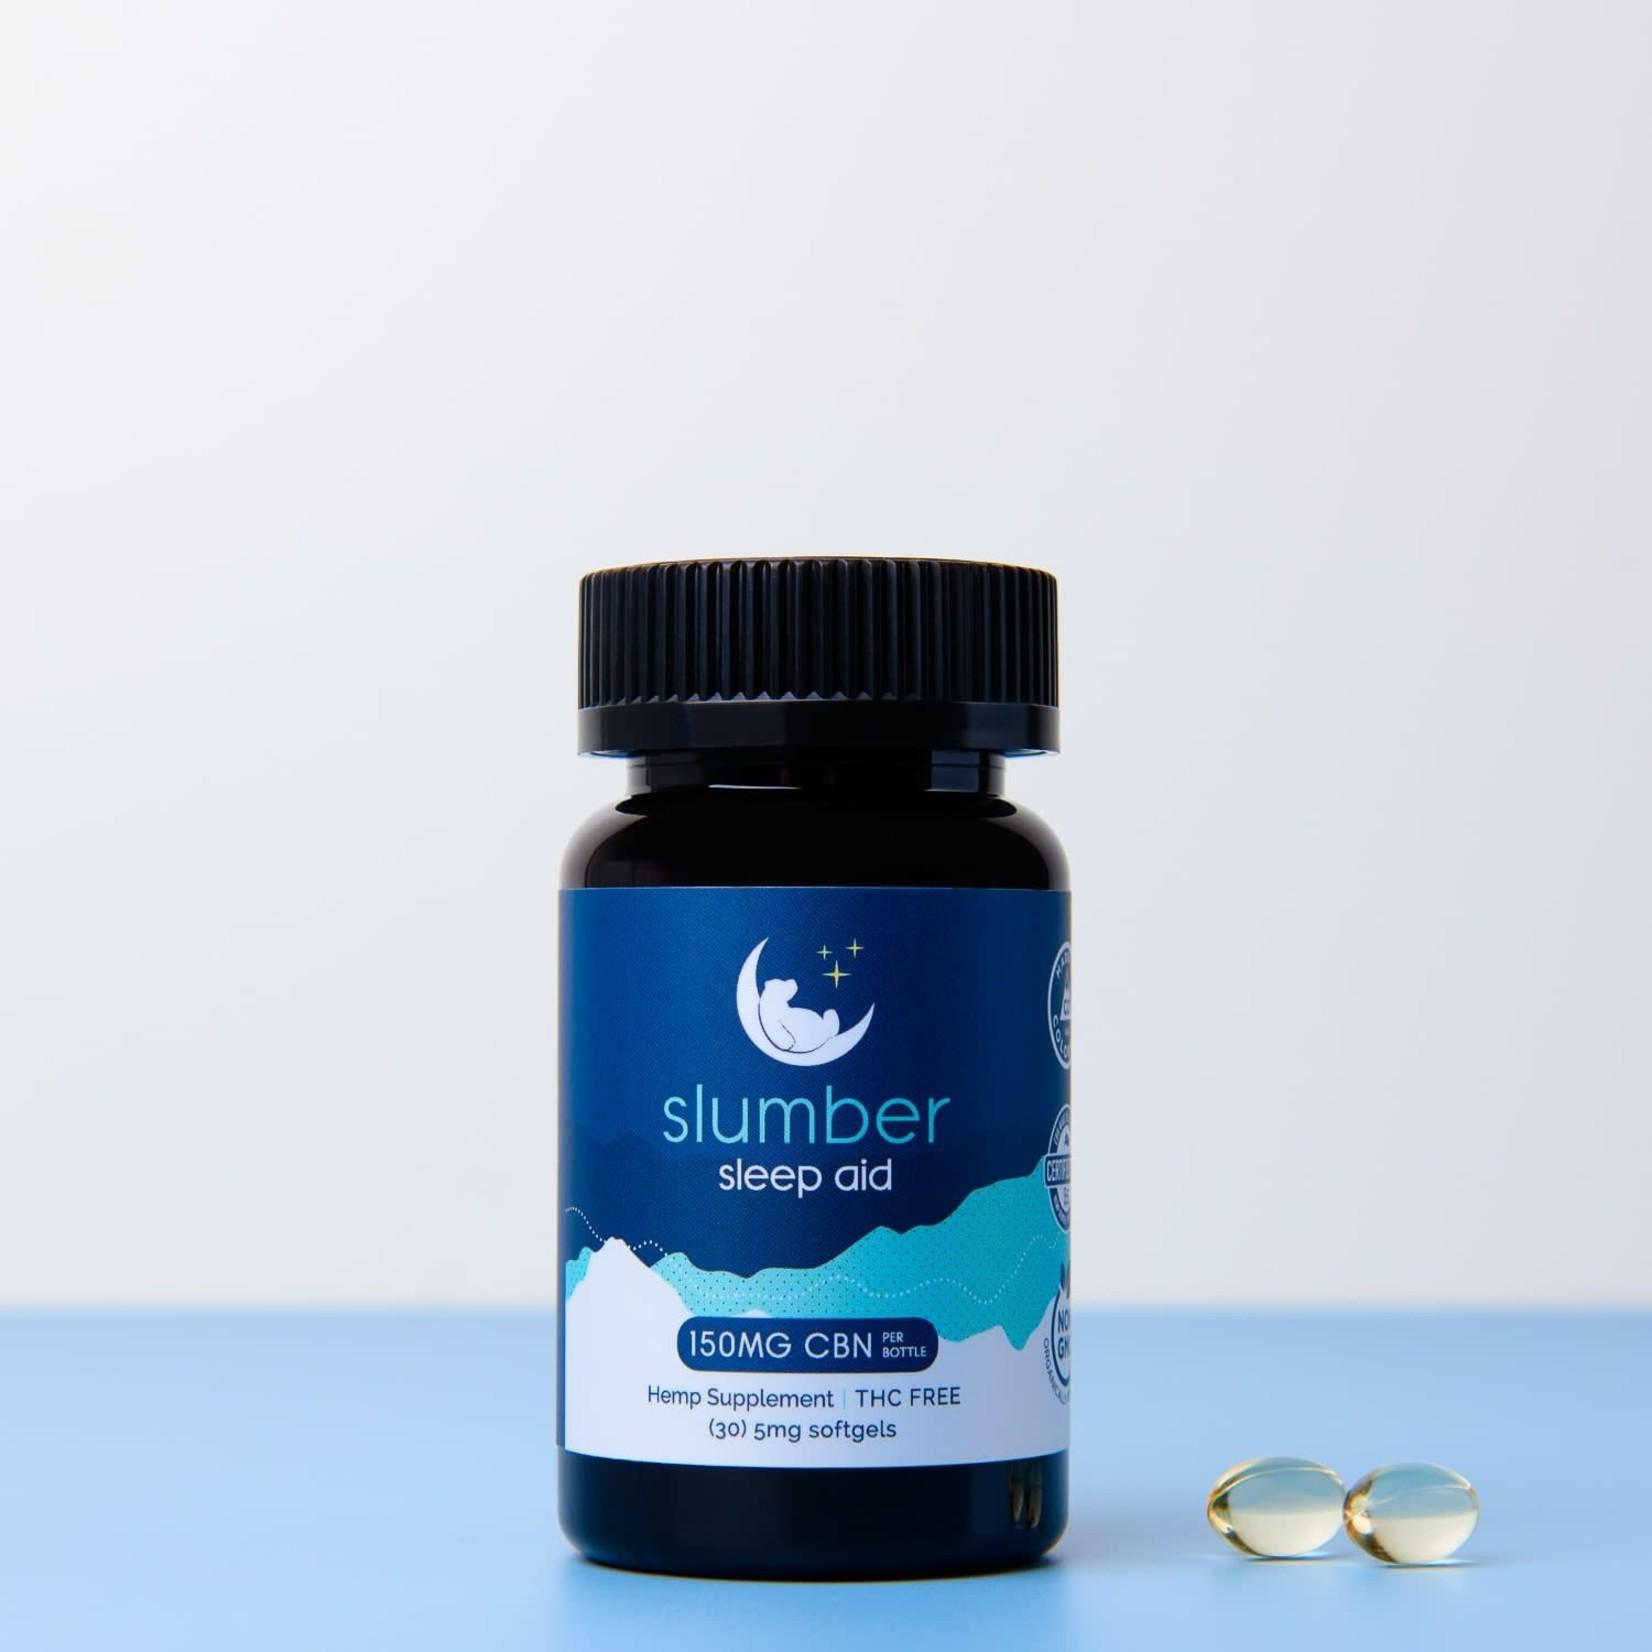 SlumberCBN Slumber Sleep Aid 150mg CBN 30ct